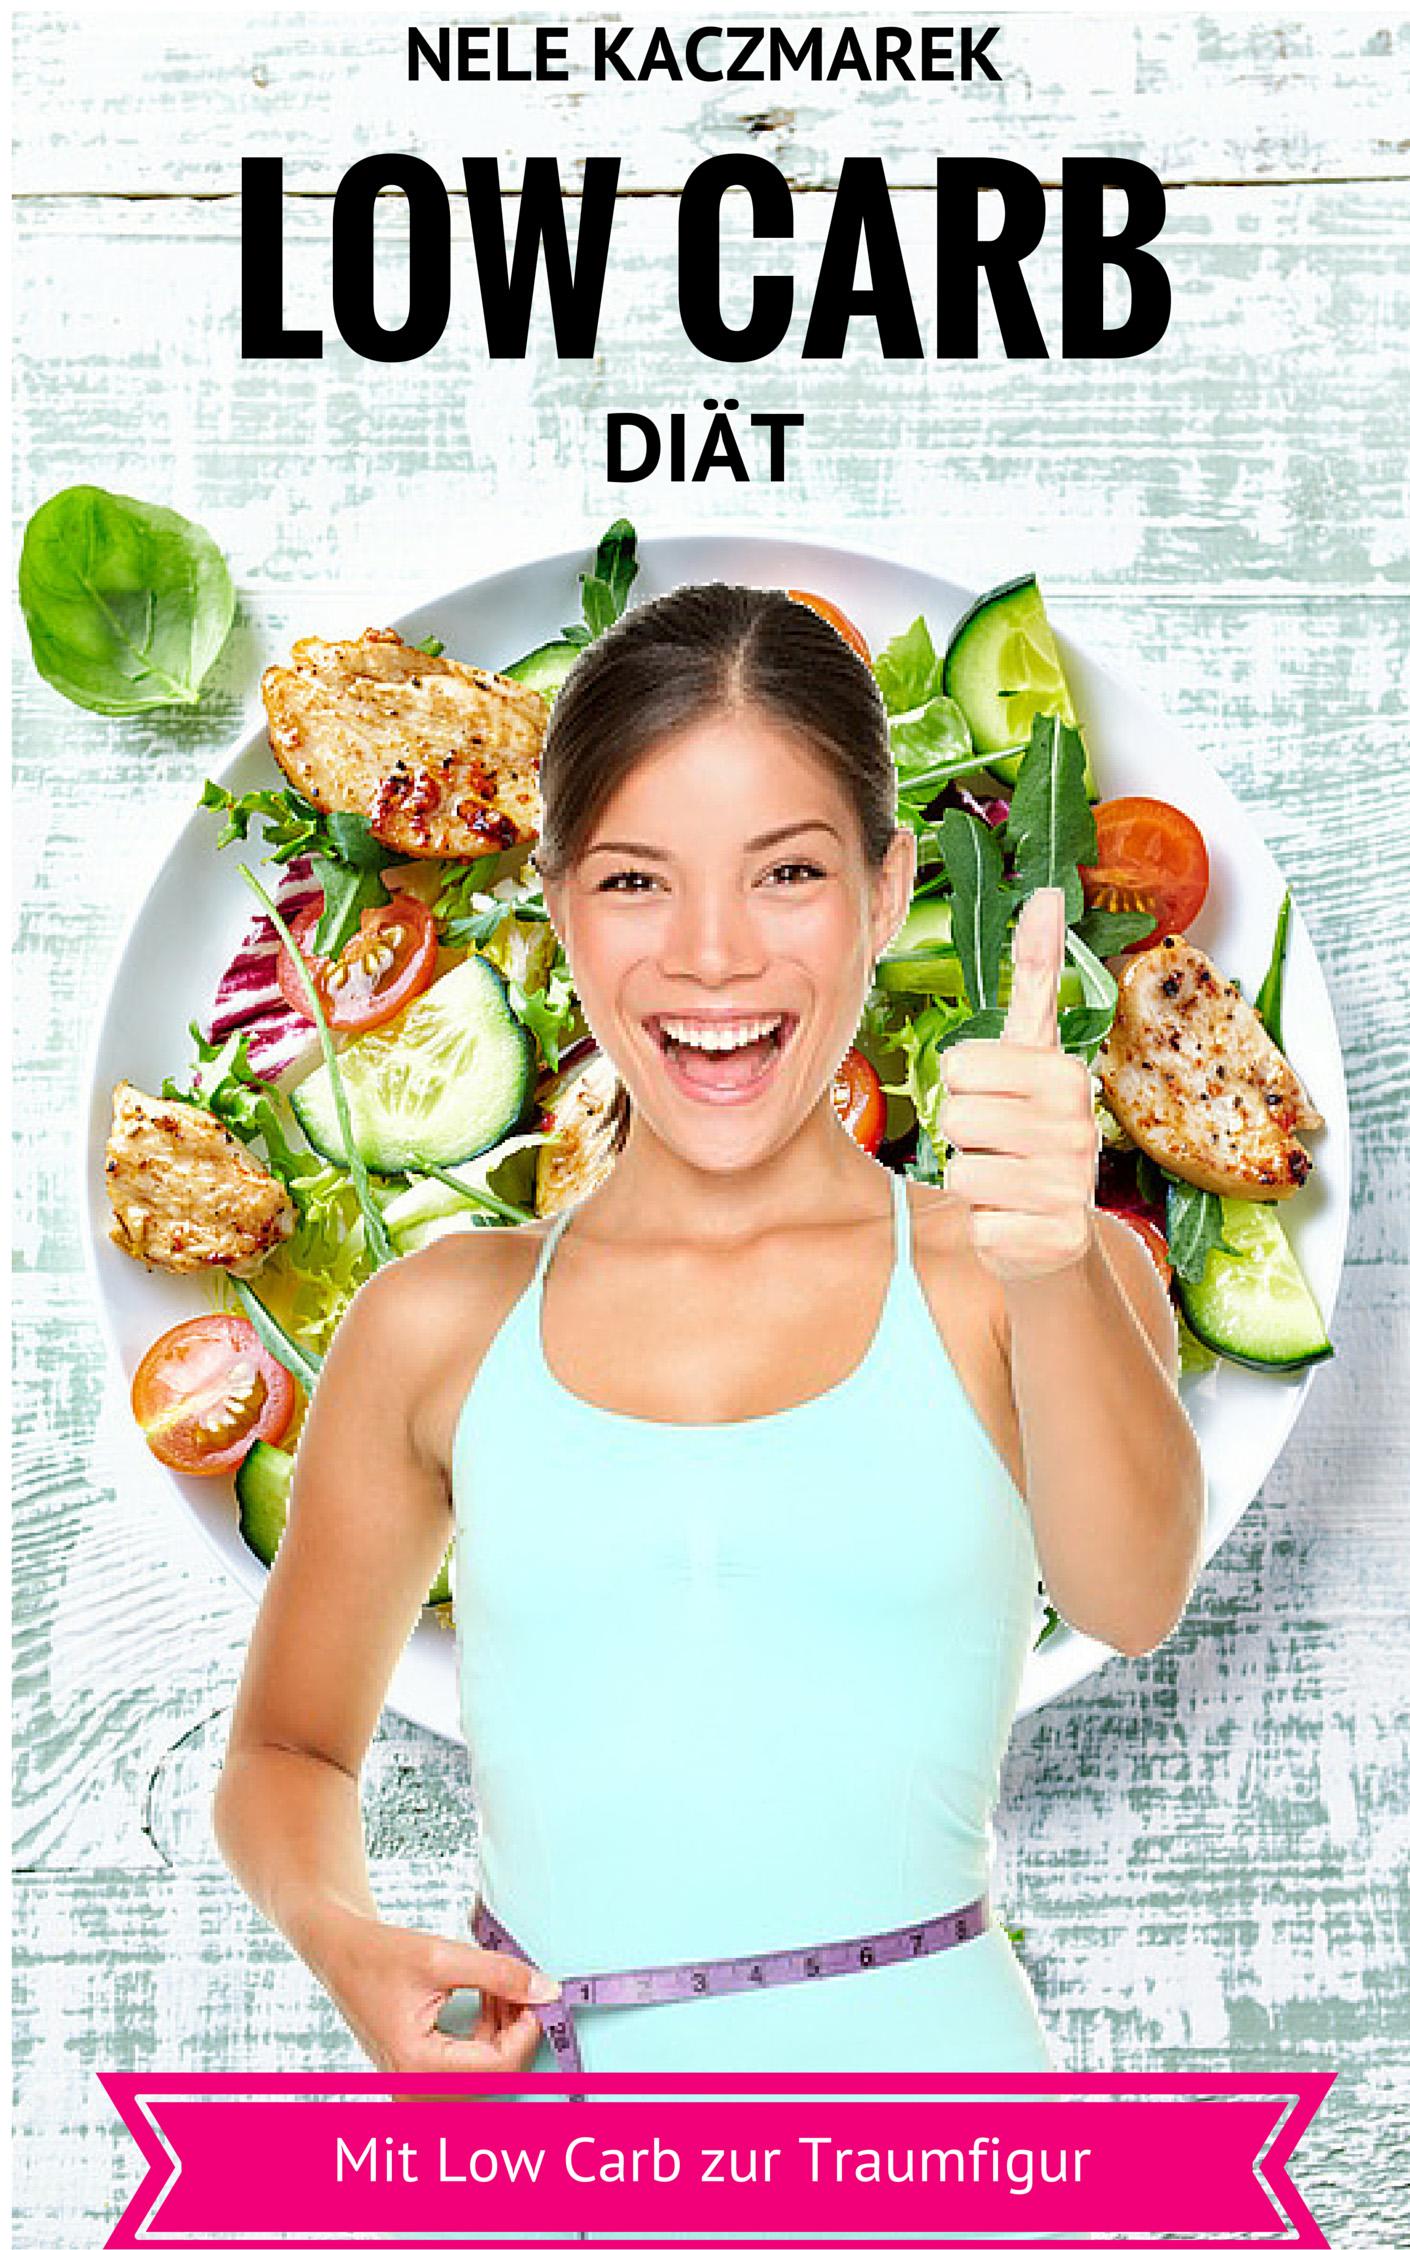 Nele Kaczmarek – Low Carb Diät: Mit wenig Kohlenhydraten viel Abnehmen